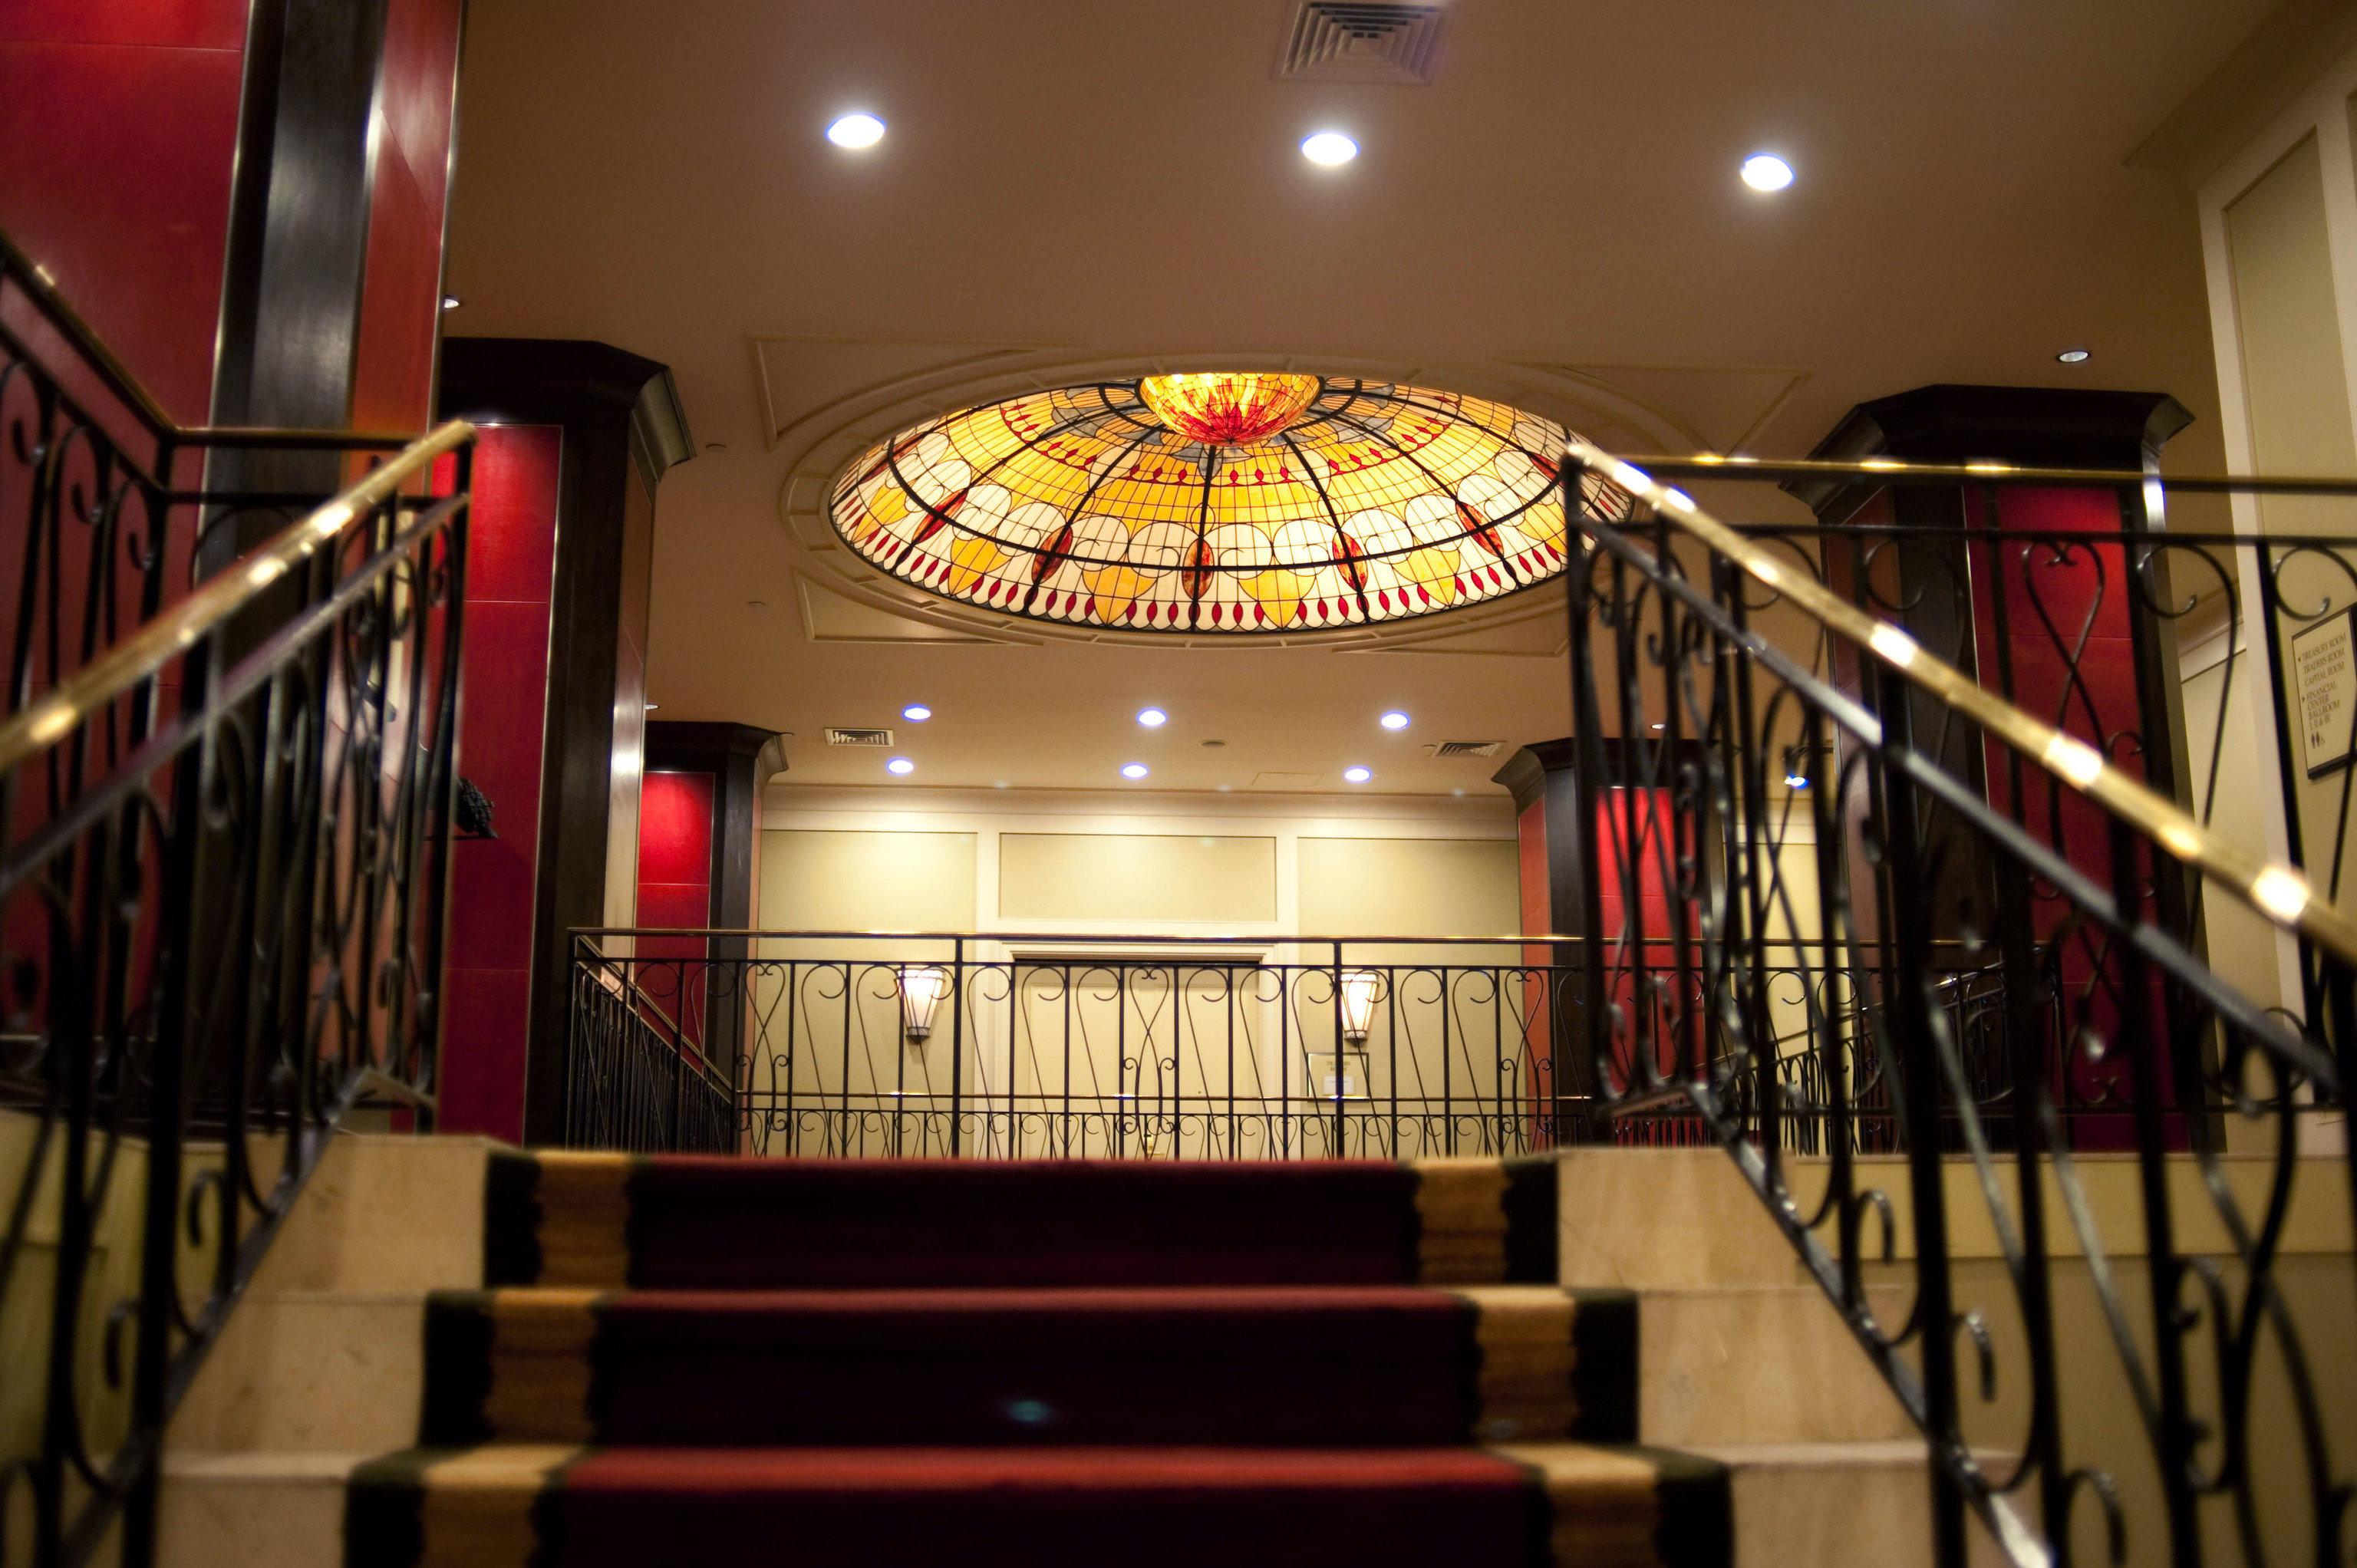 chair building restaurant Bar tourist attraction metal step